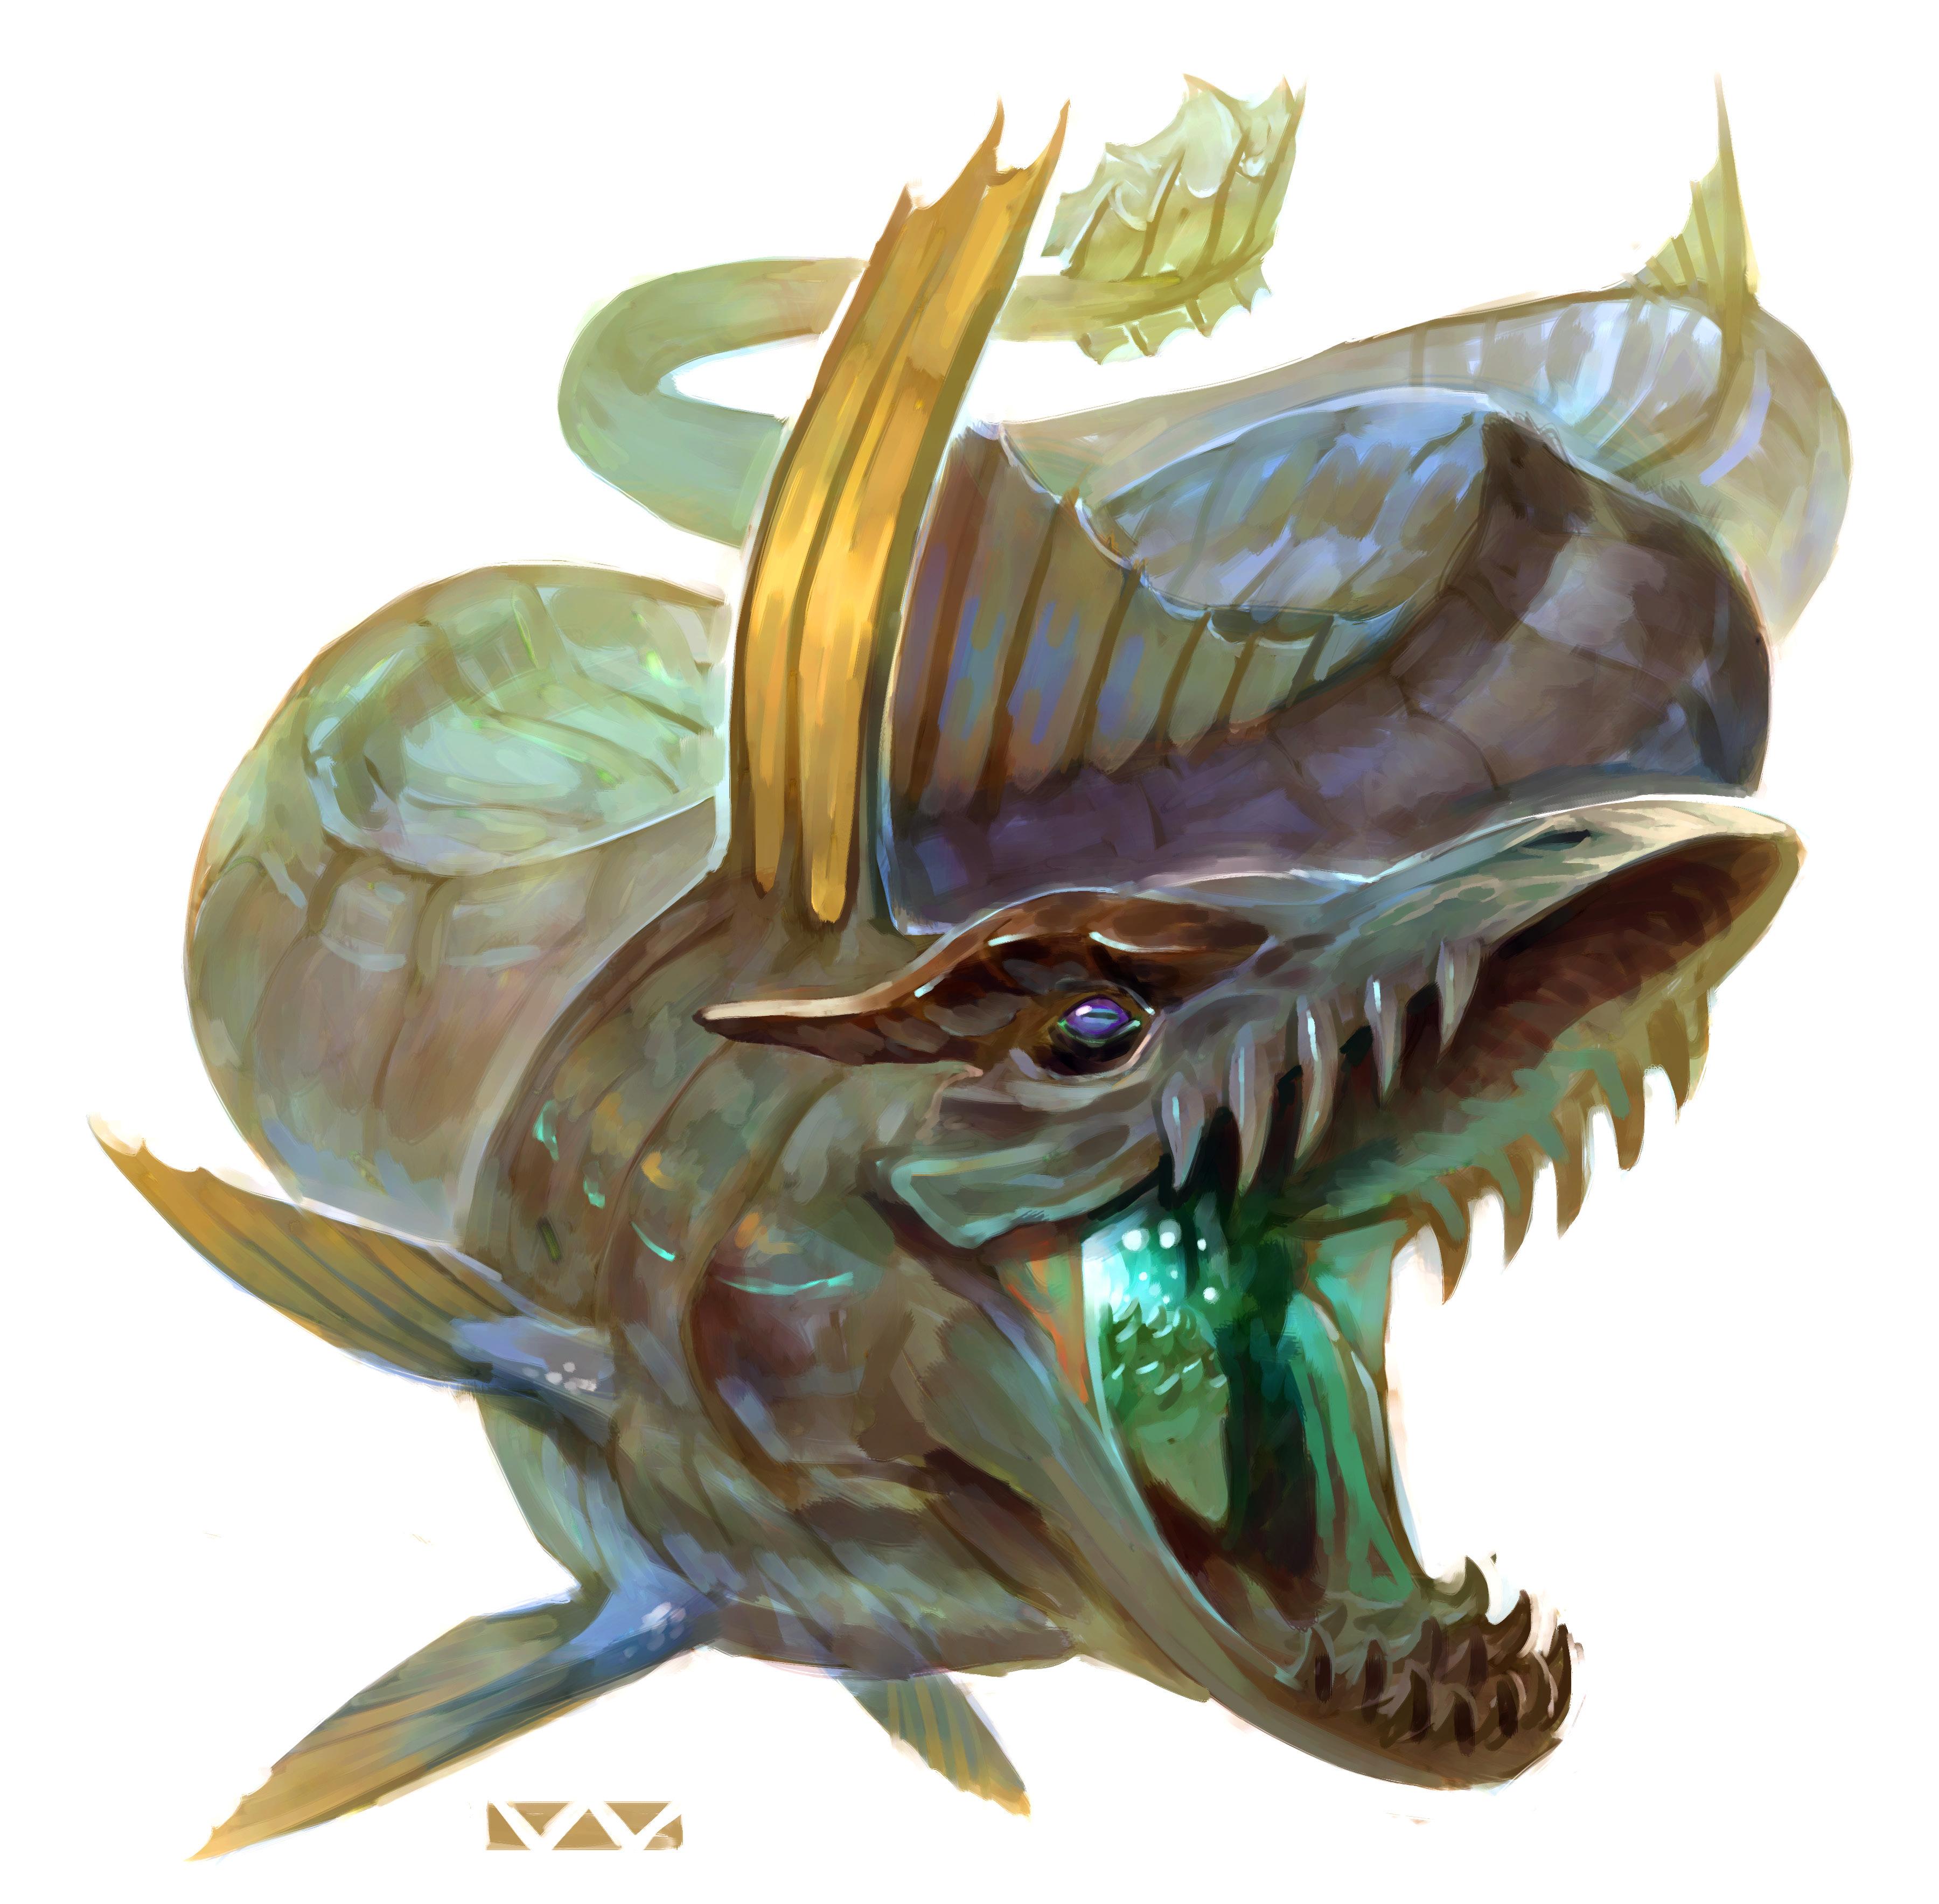 "stephen-wood ""River Wurm"" - by Stephen Wood Dungeon Master's Guild ""Angler: a Ranger's Path"" (2018-02) © Wizards of the Coast e dell'autore, tutti i diritti riservati"